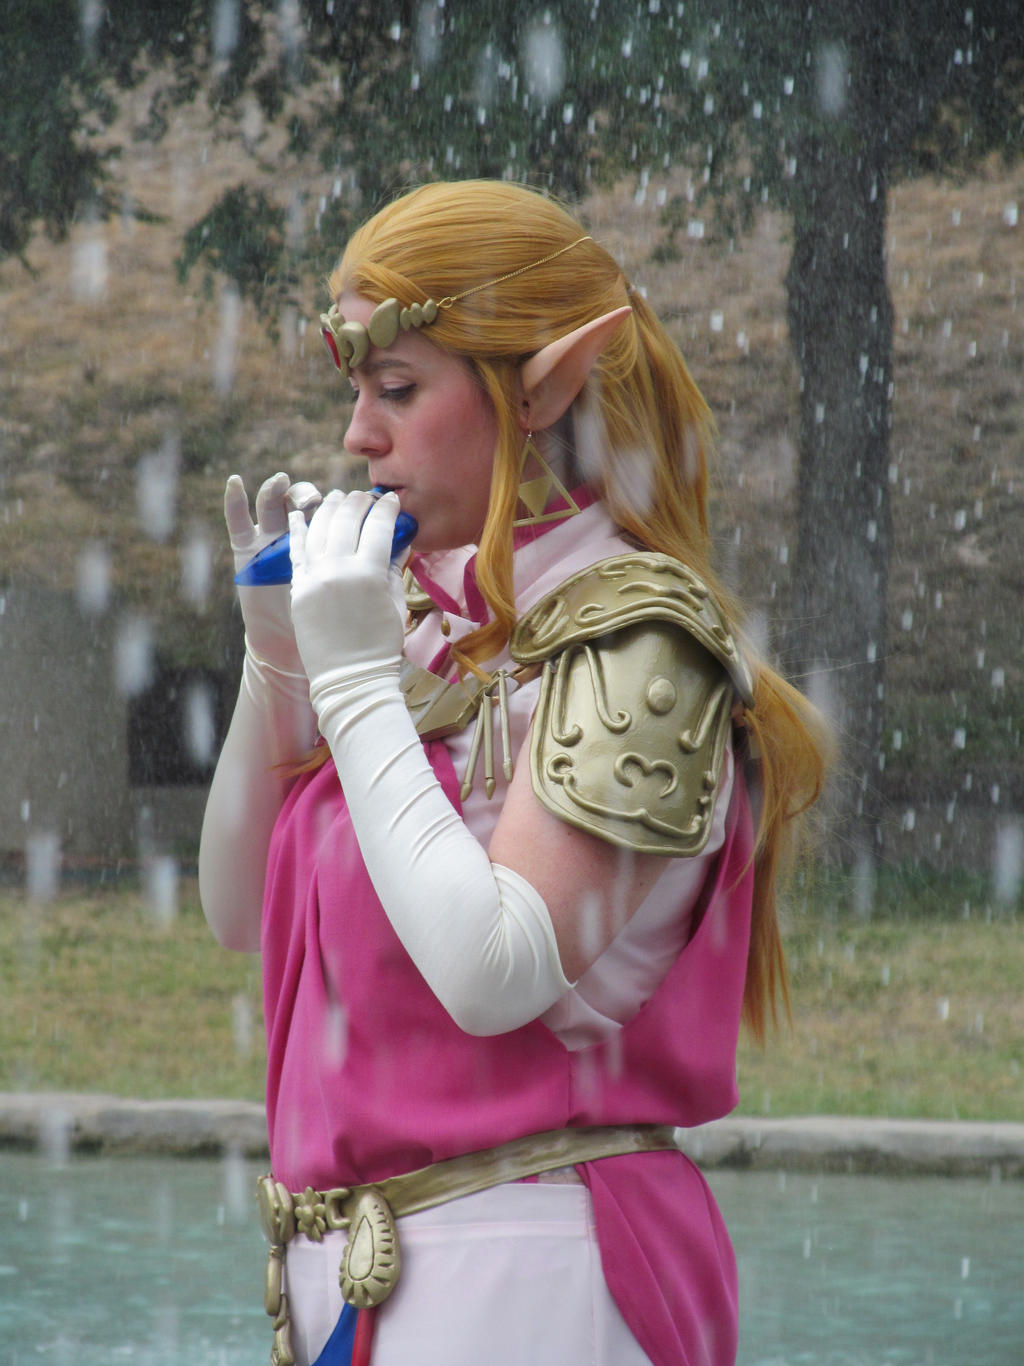 Zelda's Lullaby by haru5319